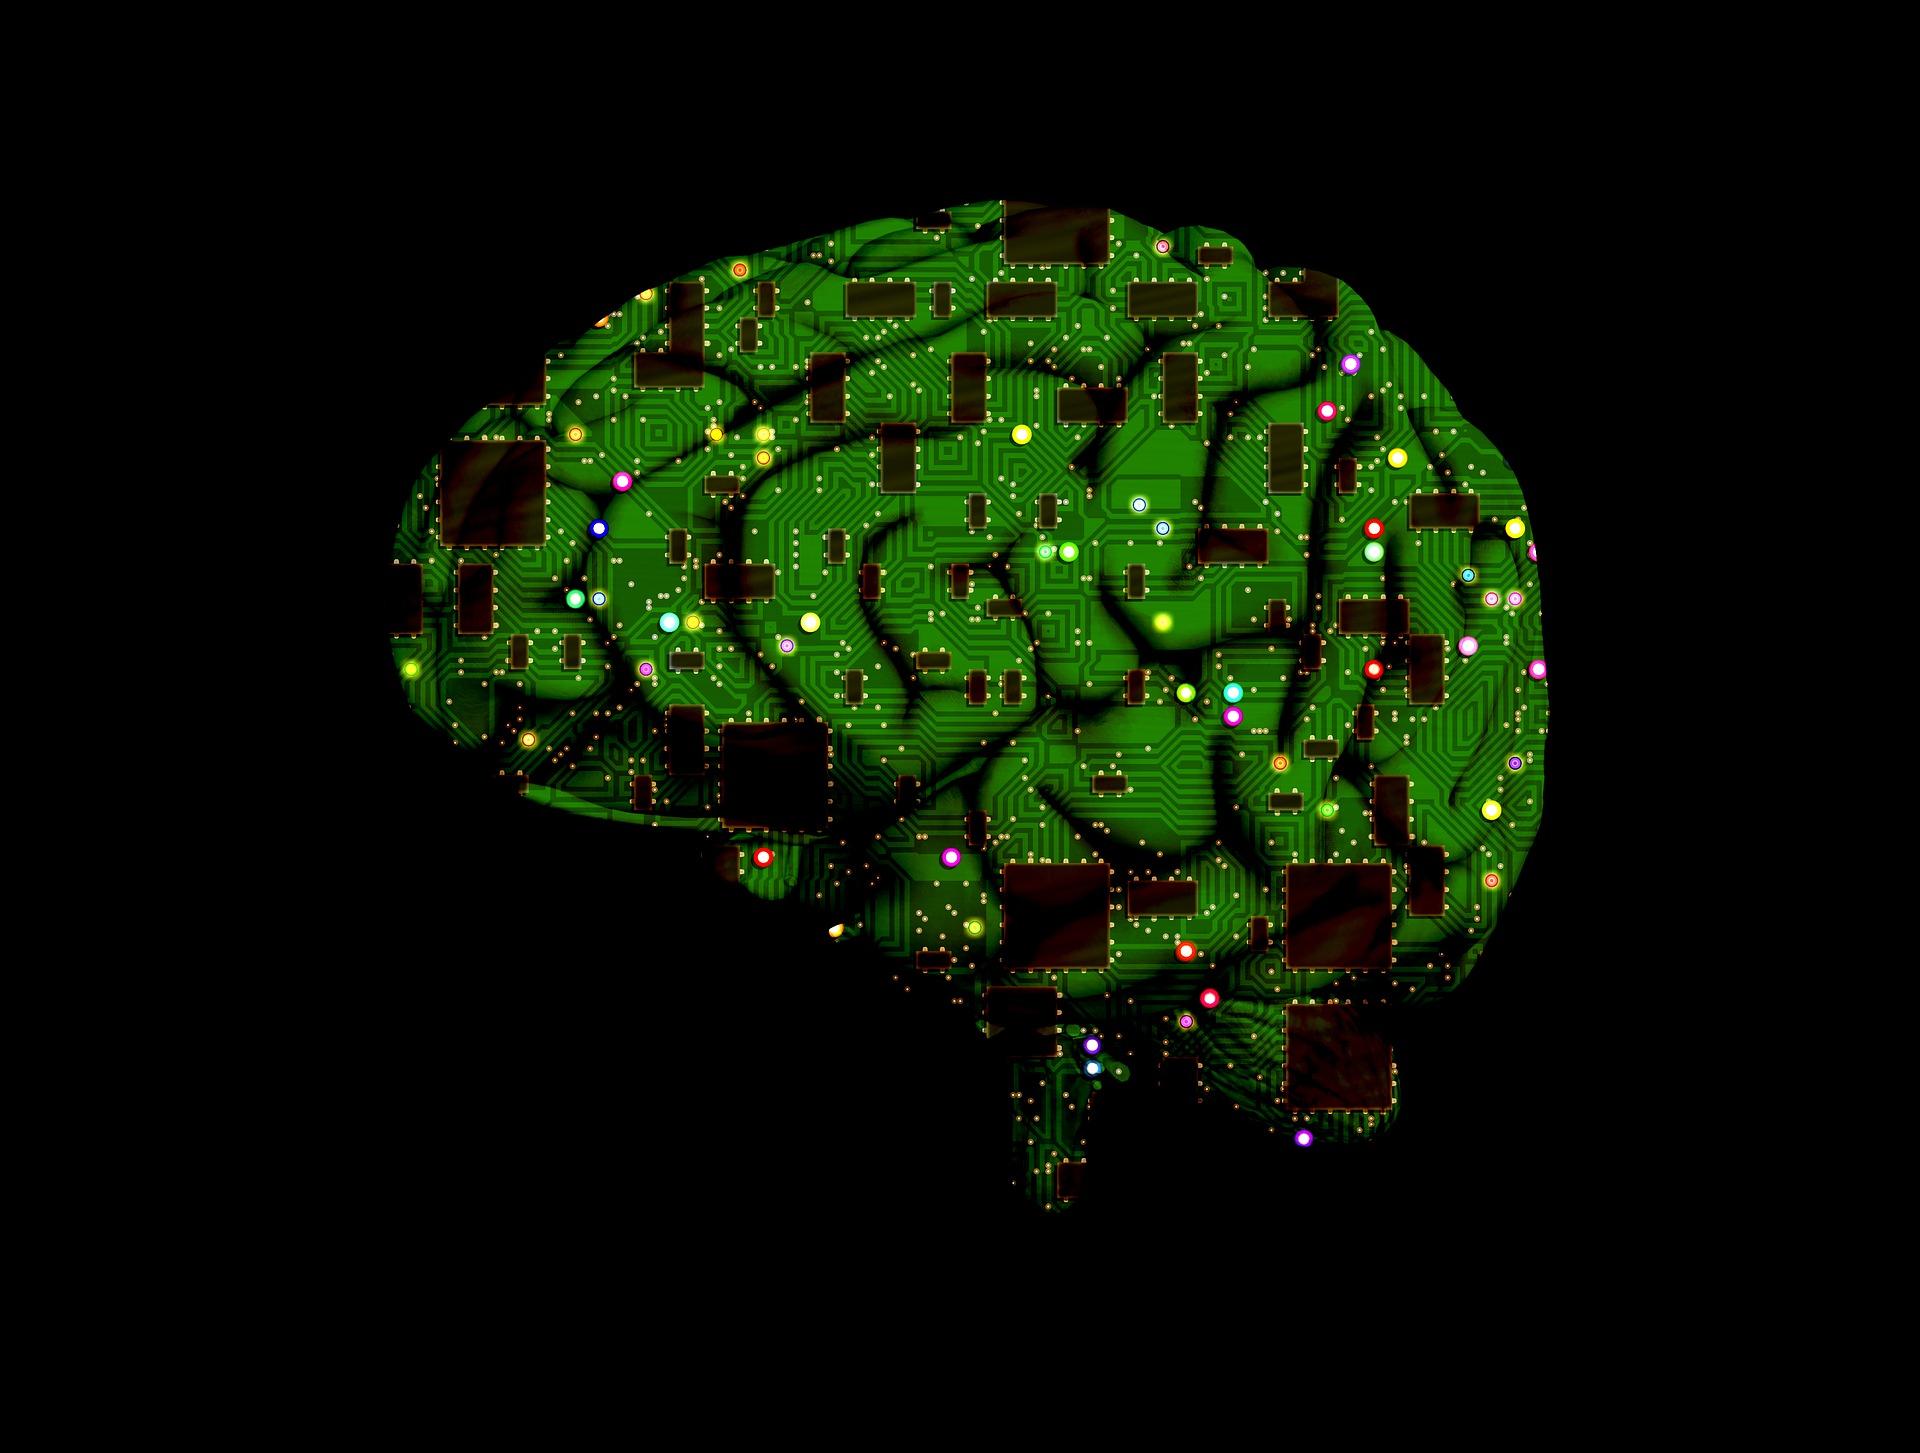 brain-1845944_1920